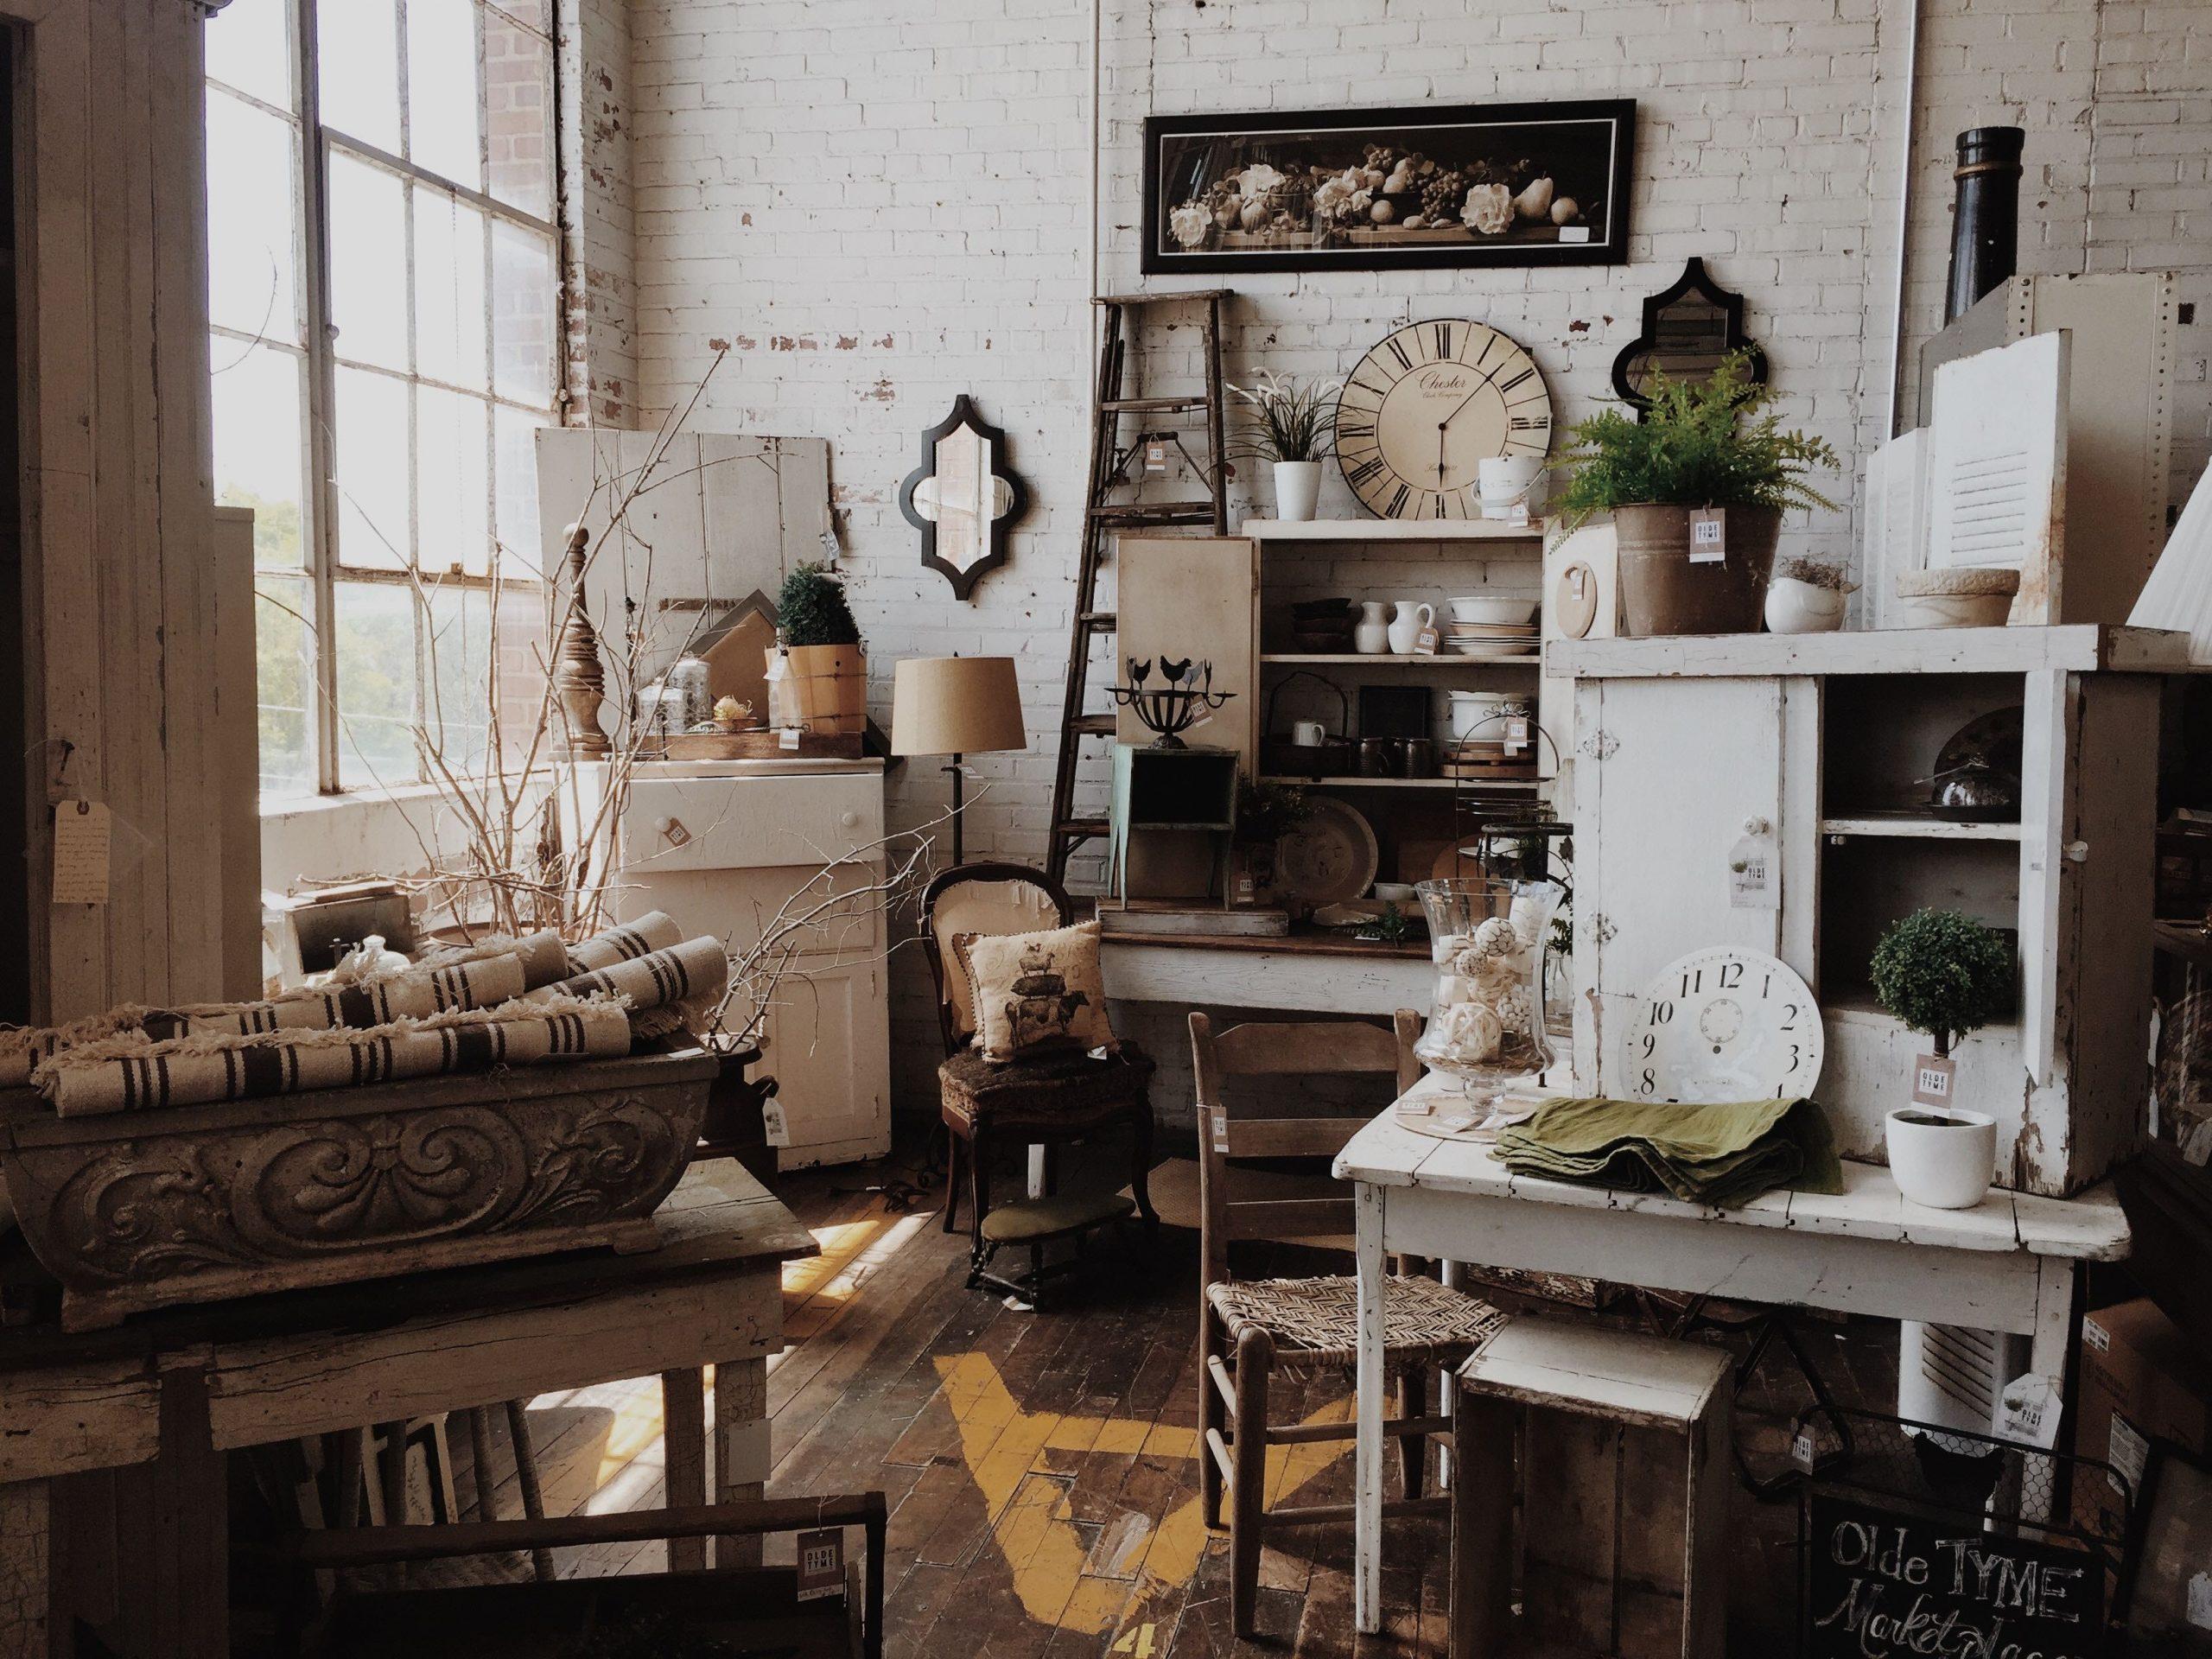 A disorganized room